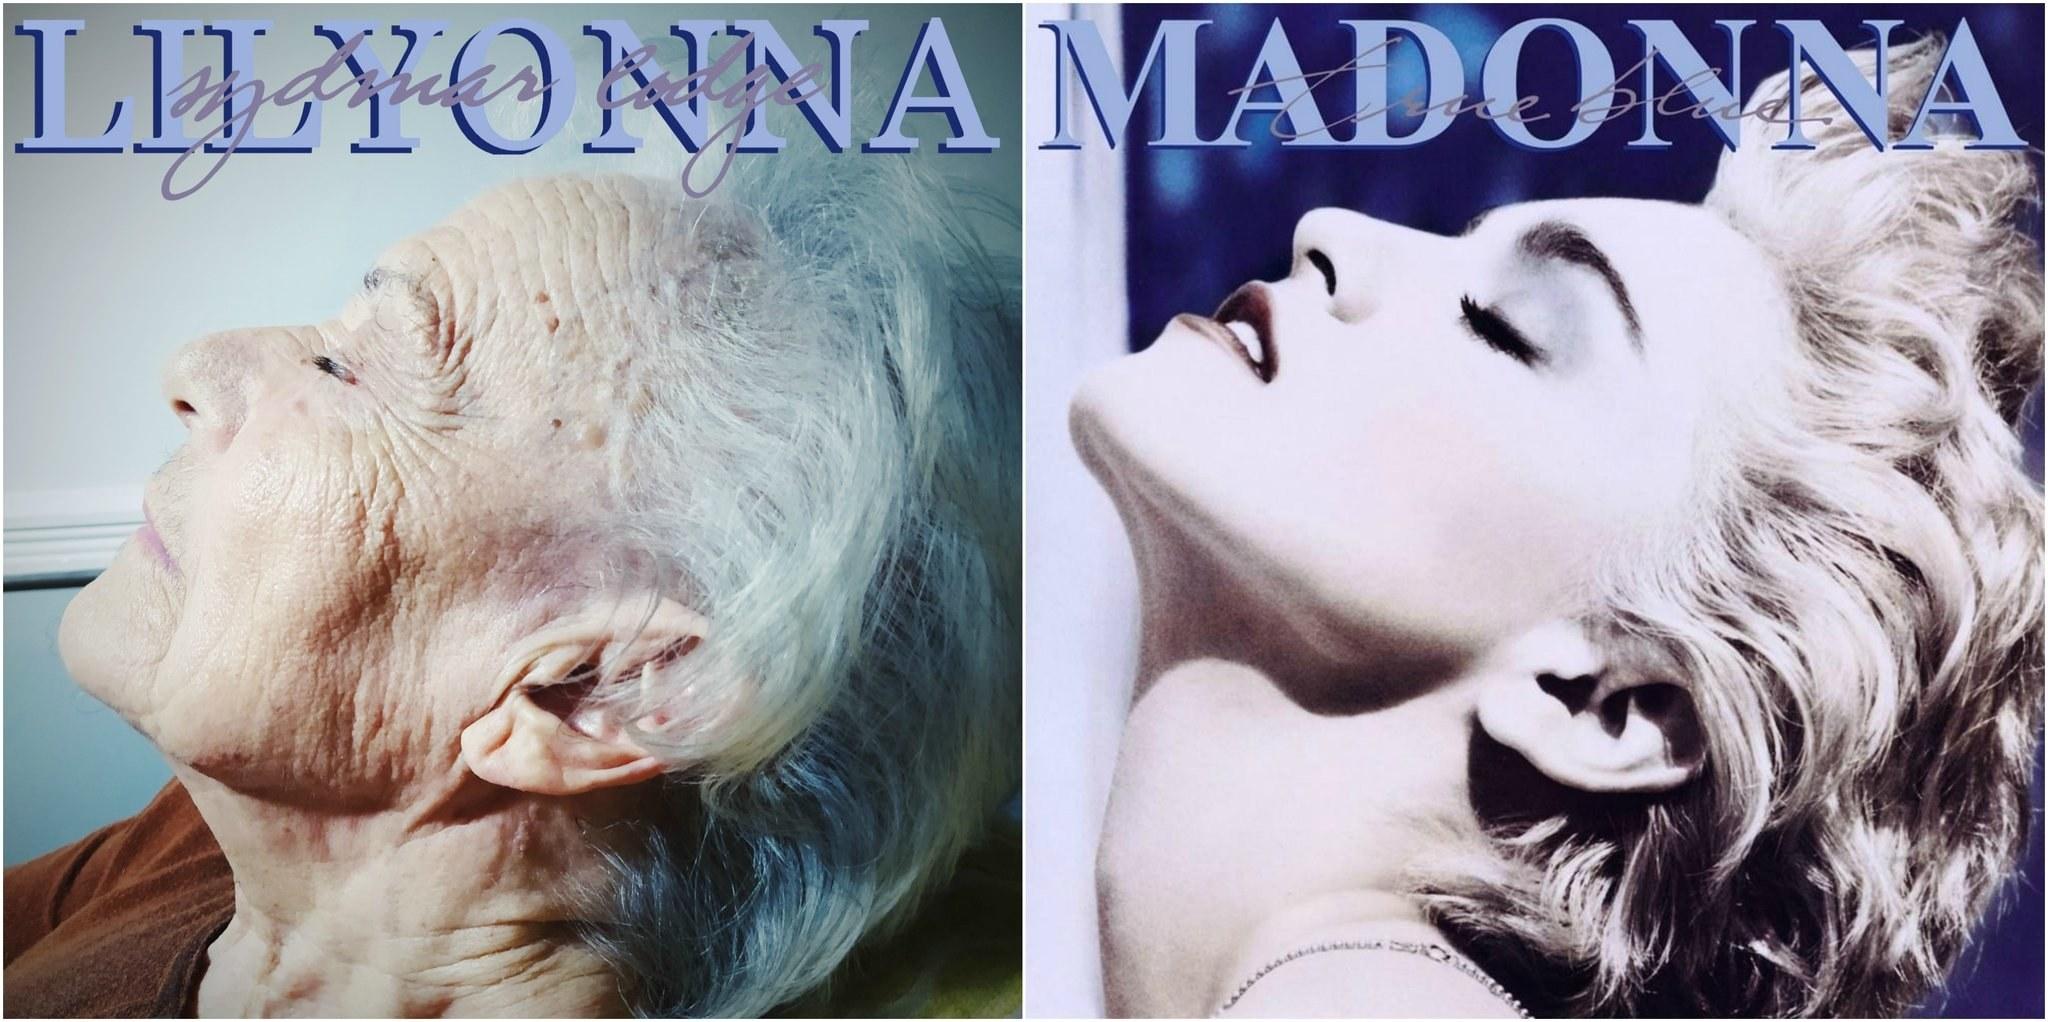 An elderly woman recreating Madonna's Love Blind album cover